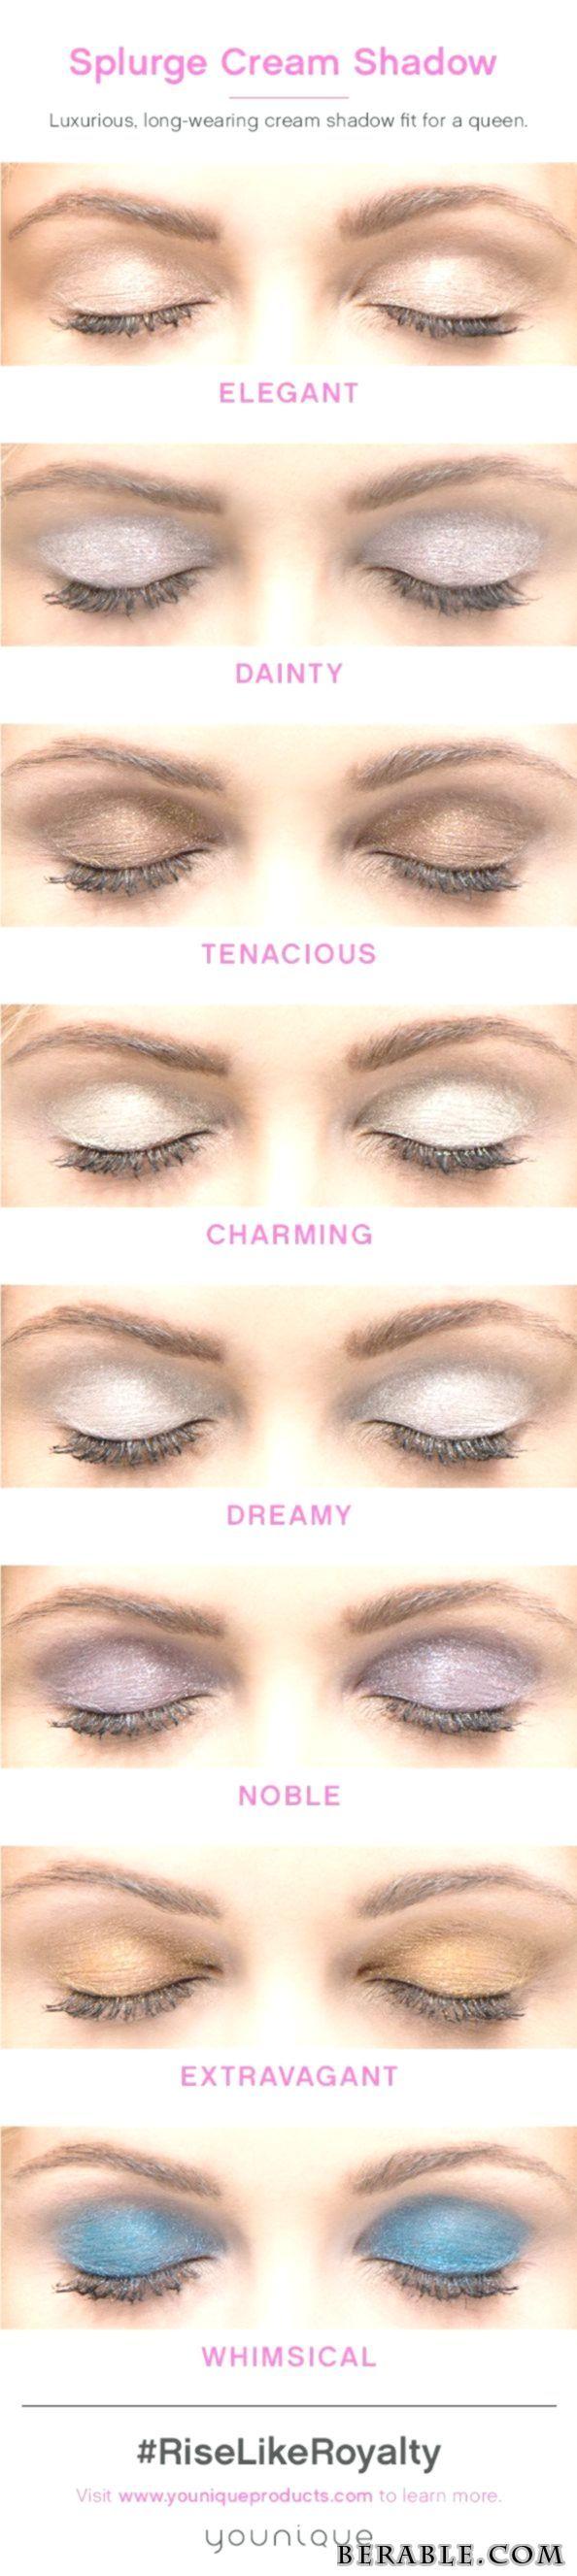 BSGSH 10 Pcs Beauty Make Up Application Tool  Eyes Eyelids Smudge Eye Shadow Ey …